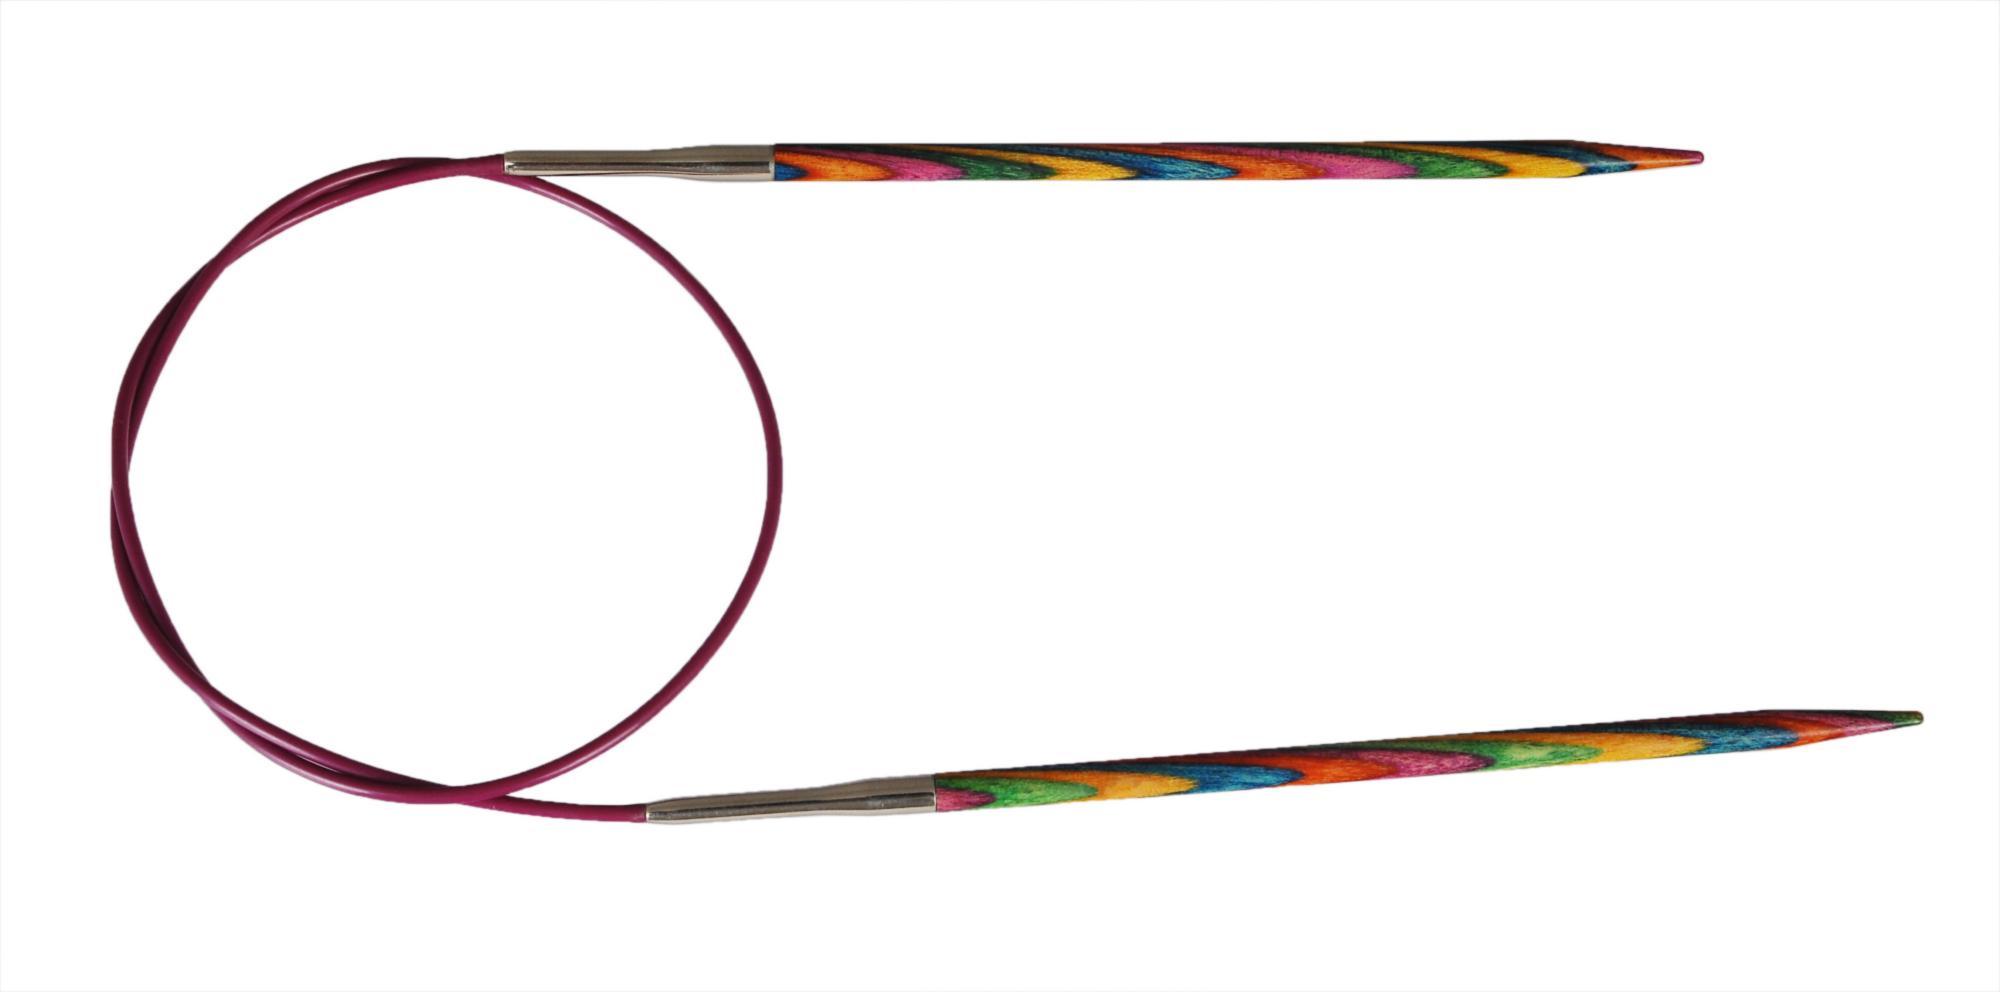 Спицы круговые 100 см Symfonie Wood KnitPro, 21354, 5.00 мм